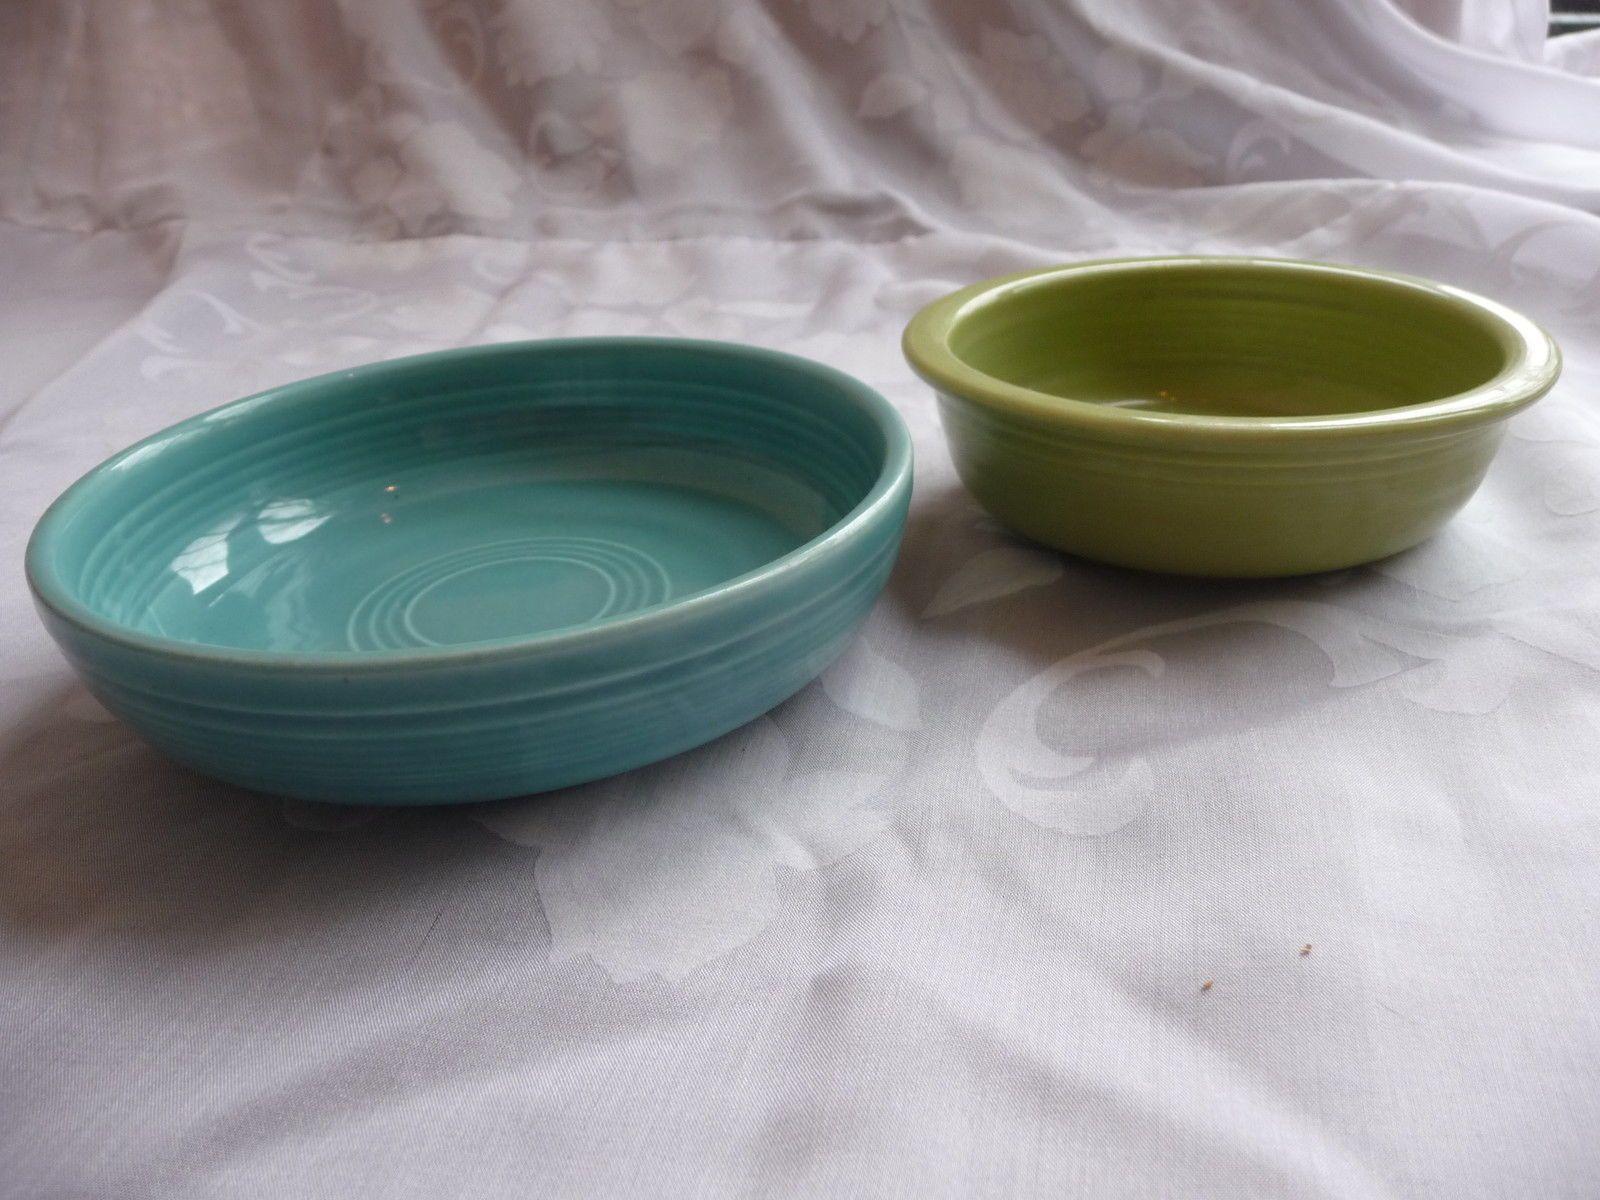 Fiesta bowl & Lot of 2 Vintage Fiesta Bowls - 4 3/4